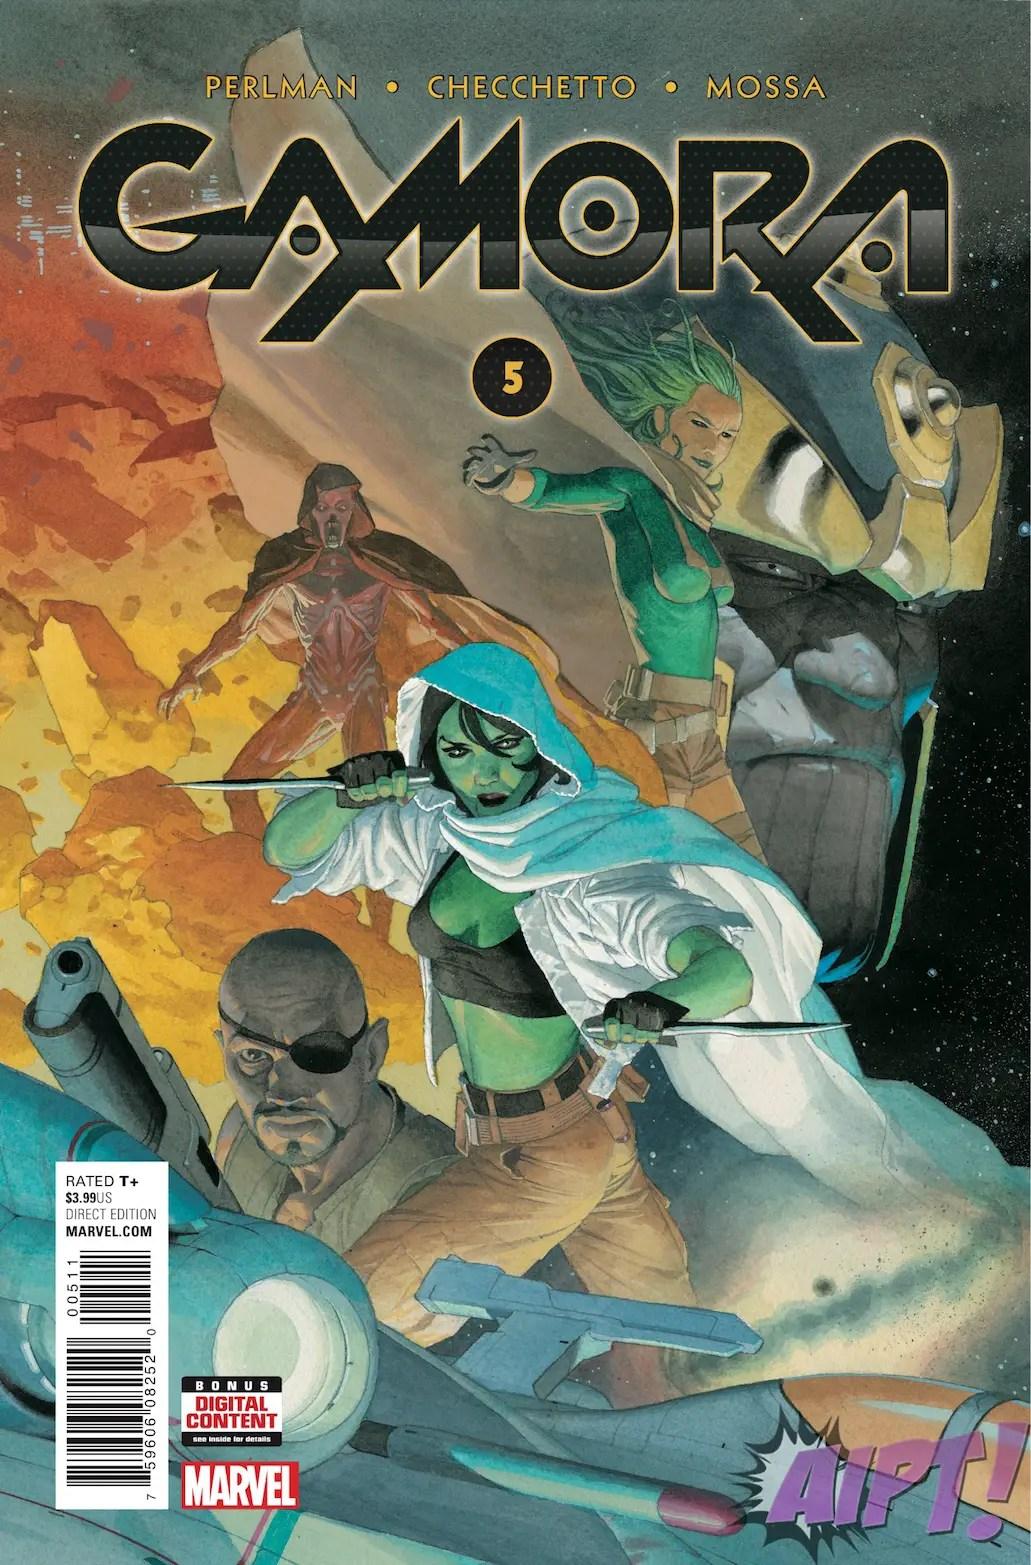 Gamora #5 Review